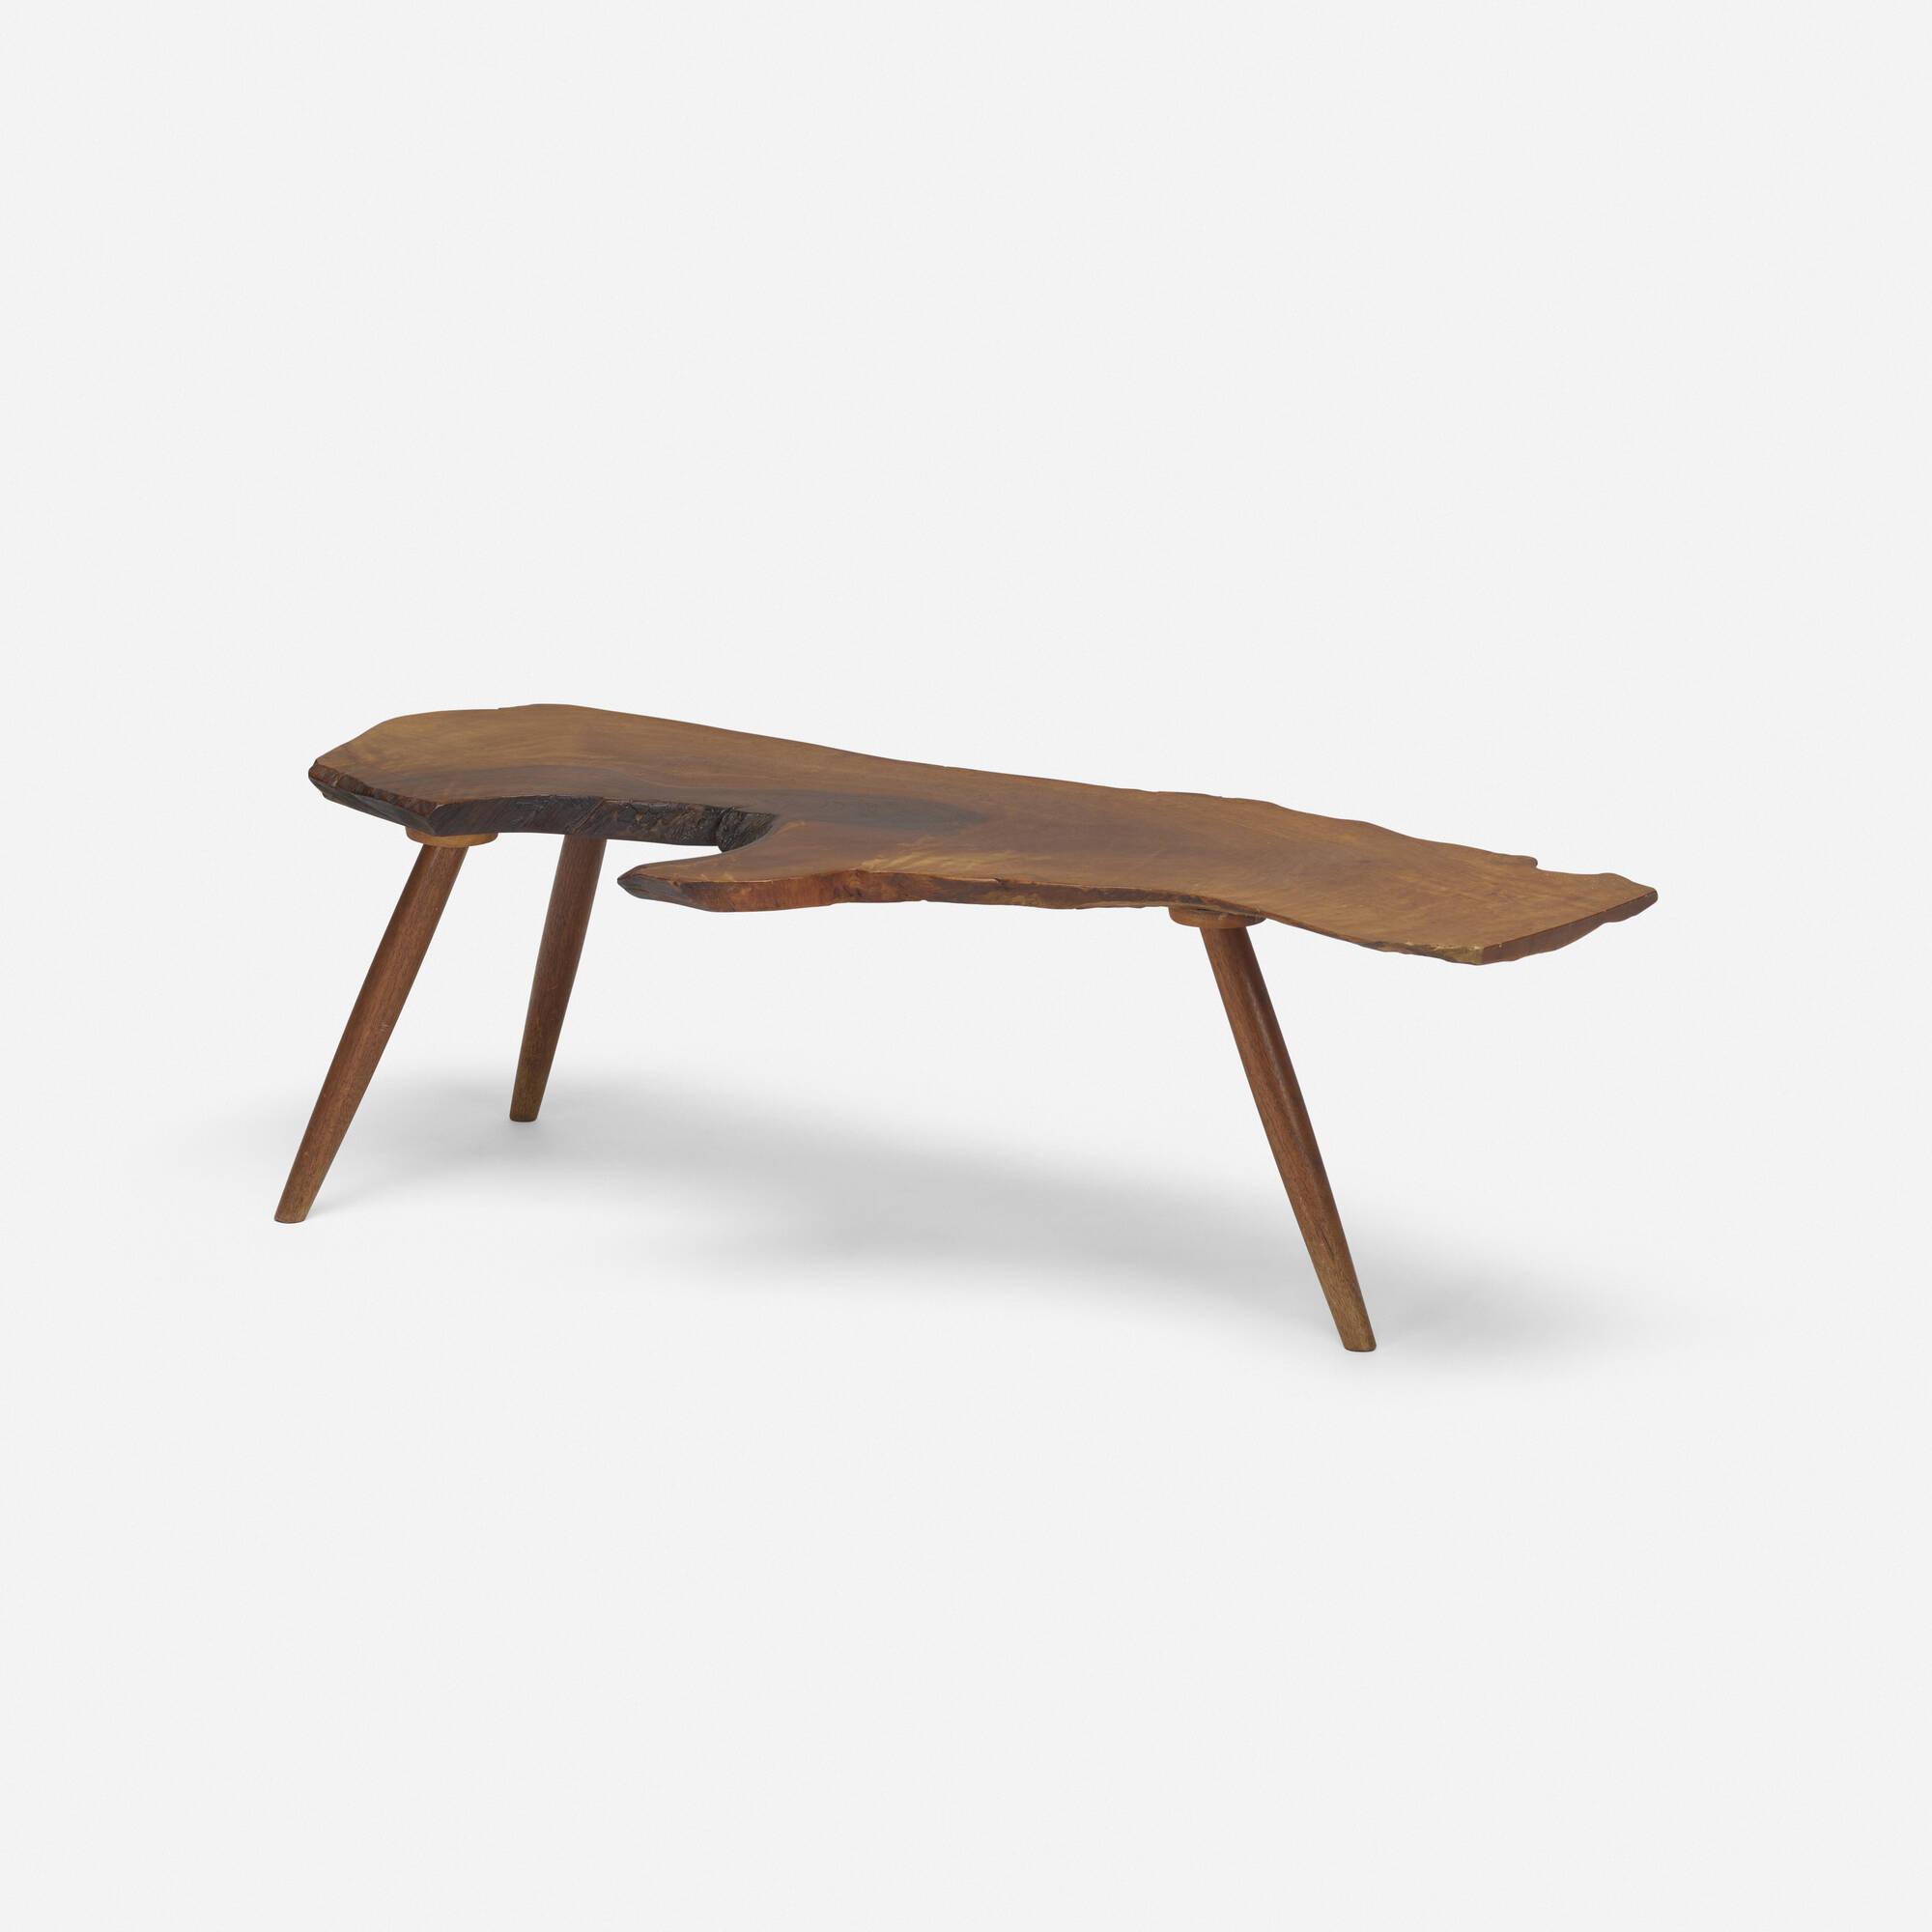 101: George Nakashima / Slab coffee table (2 of 3)